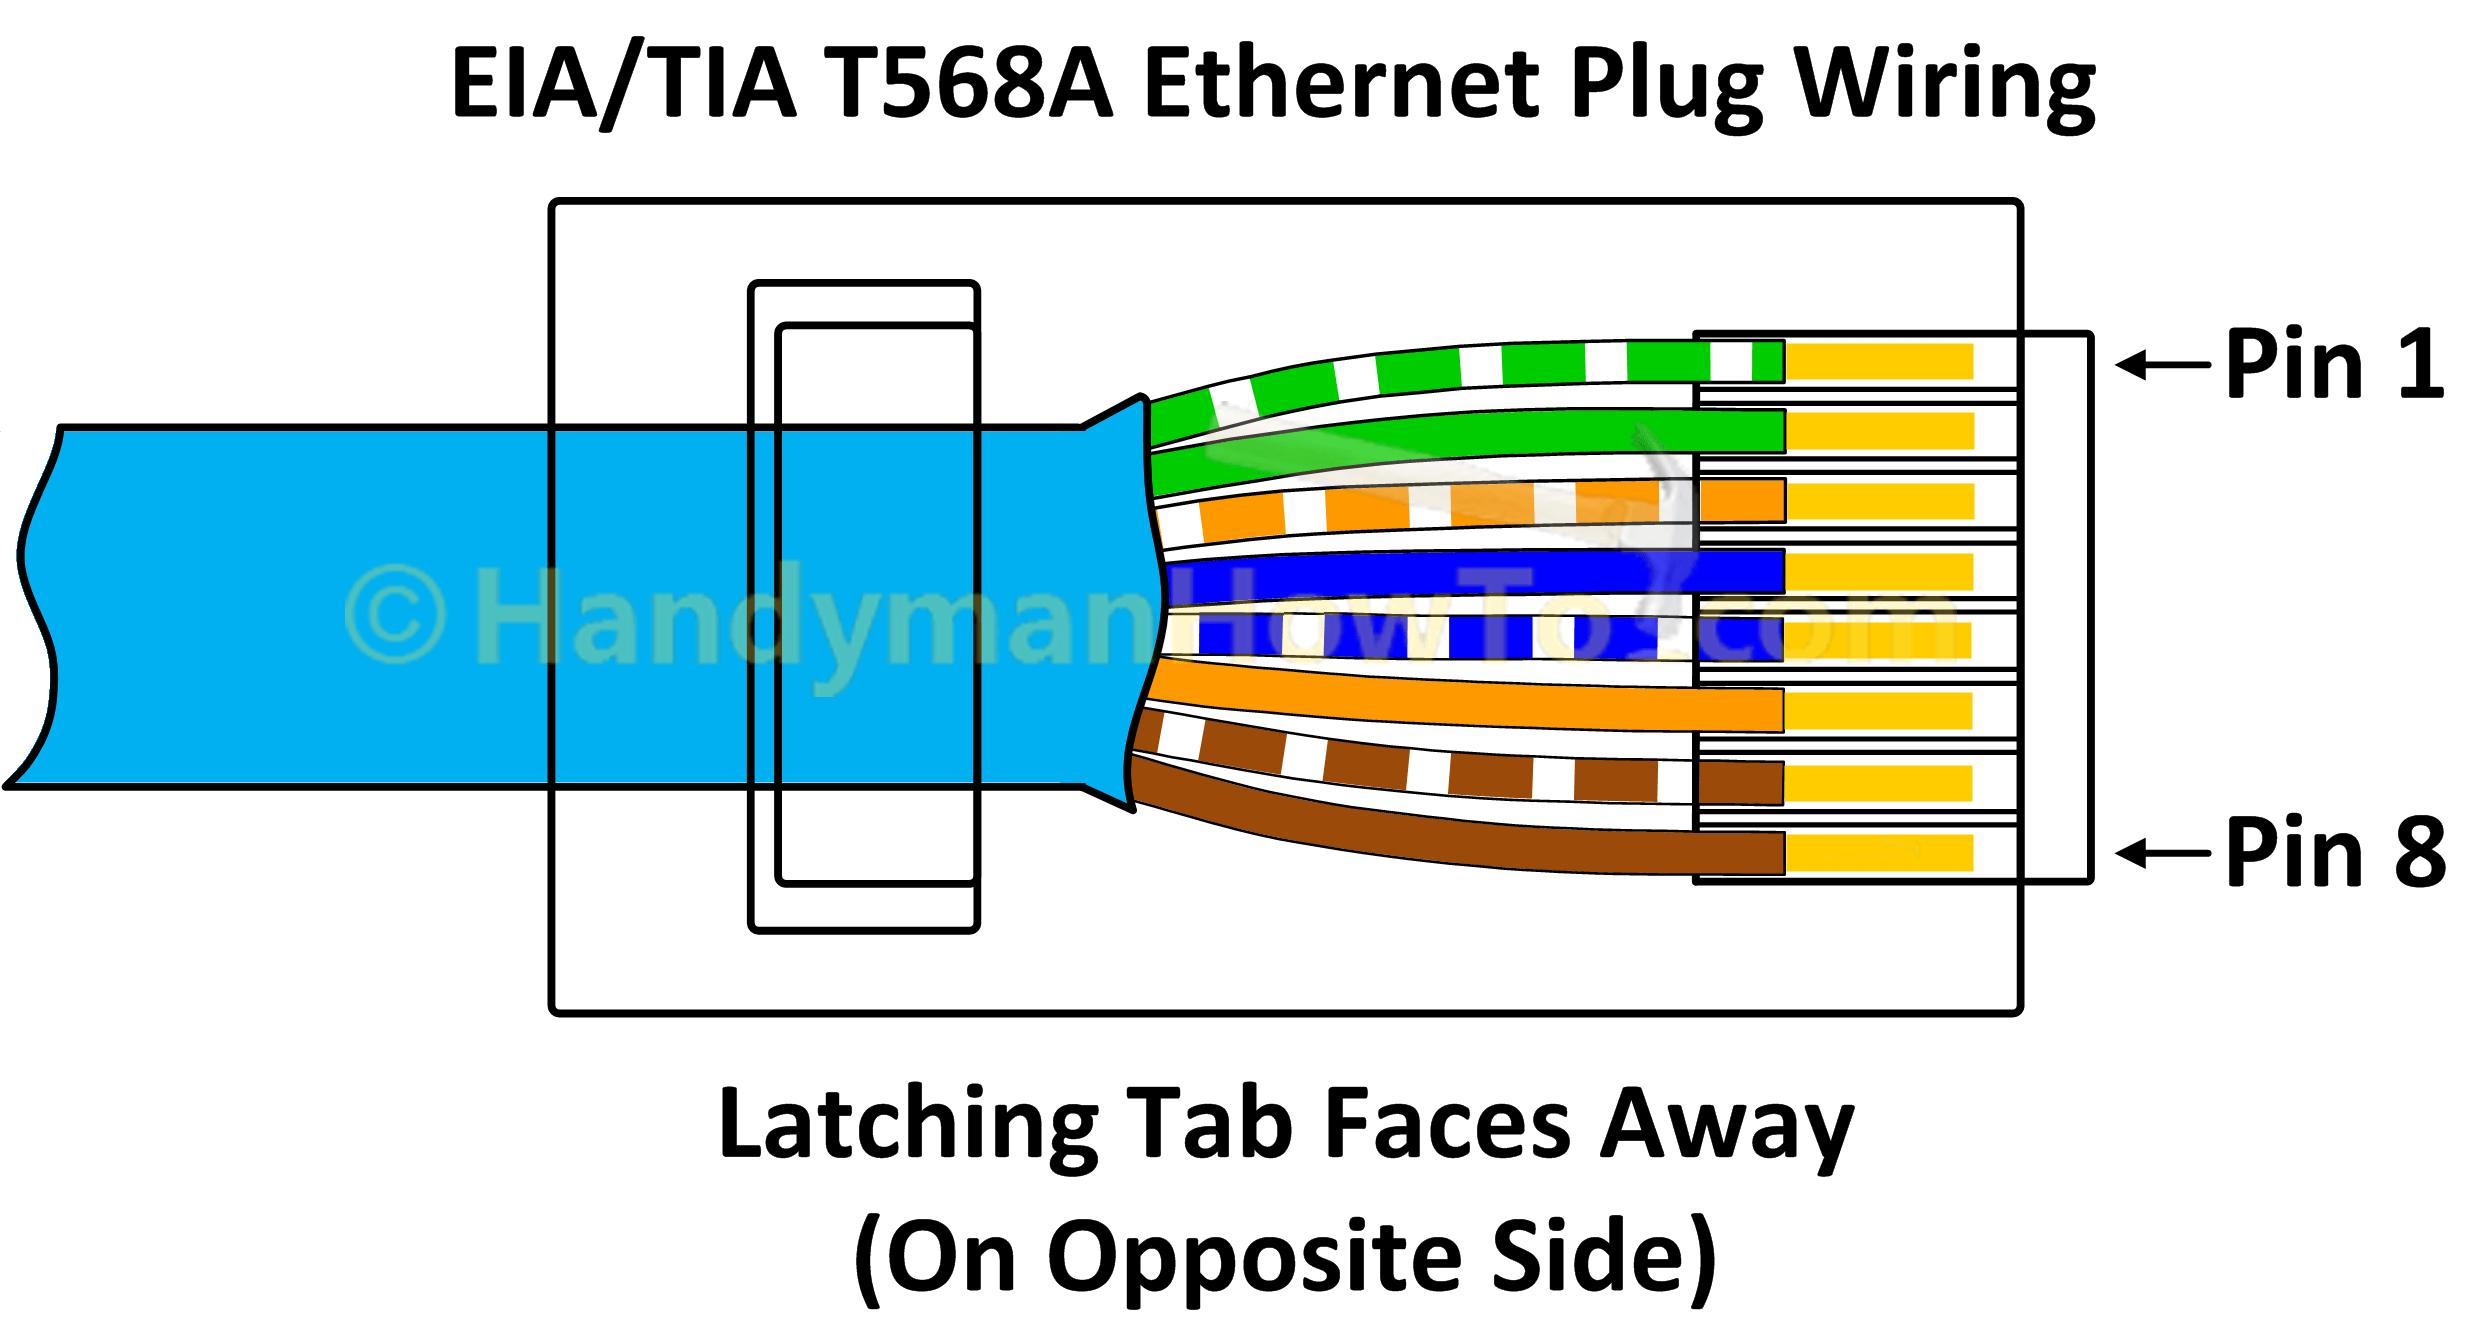 Pindaniel Sloan On Electricity | Ethernet Wiring